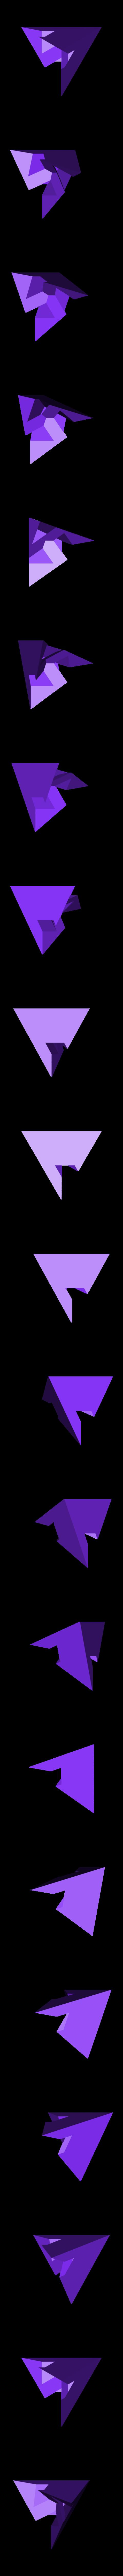 HeptagonalDodecahedronA_C3_3_flat.stl Download free STL file Heptagonal Dodecahedron (type A) (C3-symmetric form 3) • 3D printer template, tone001